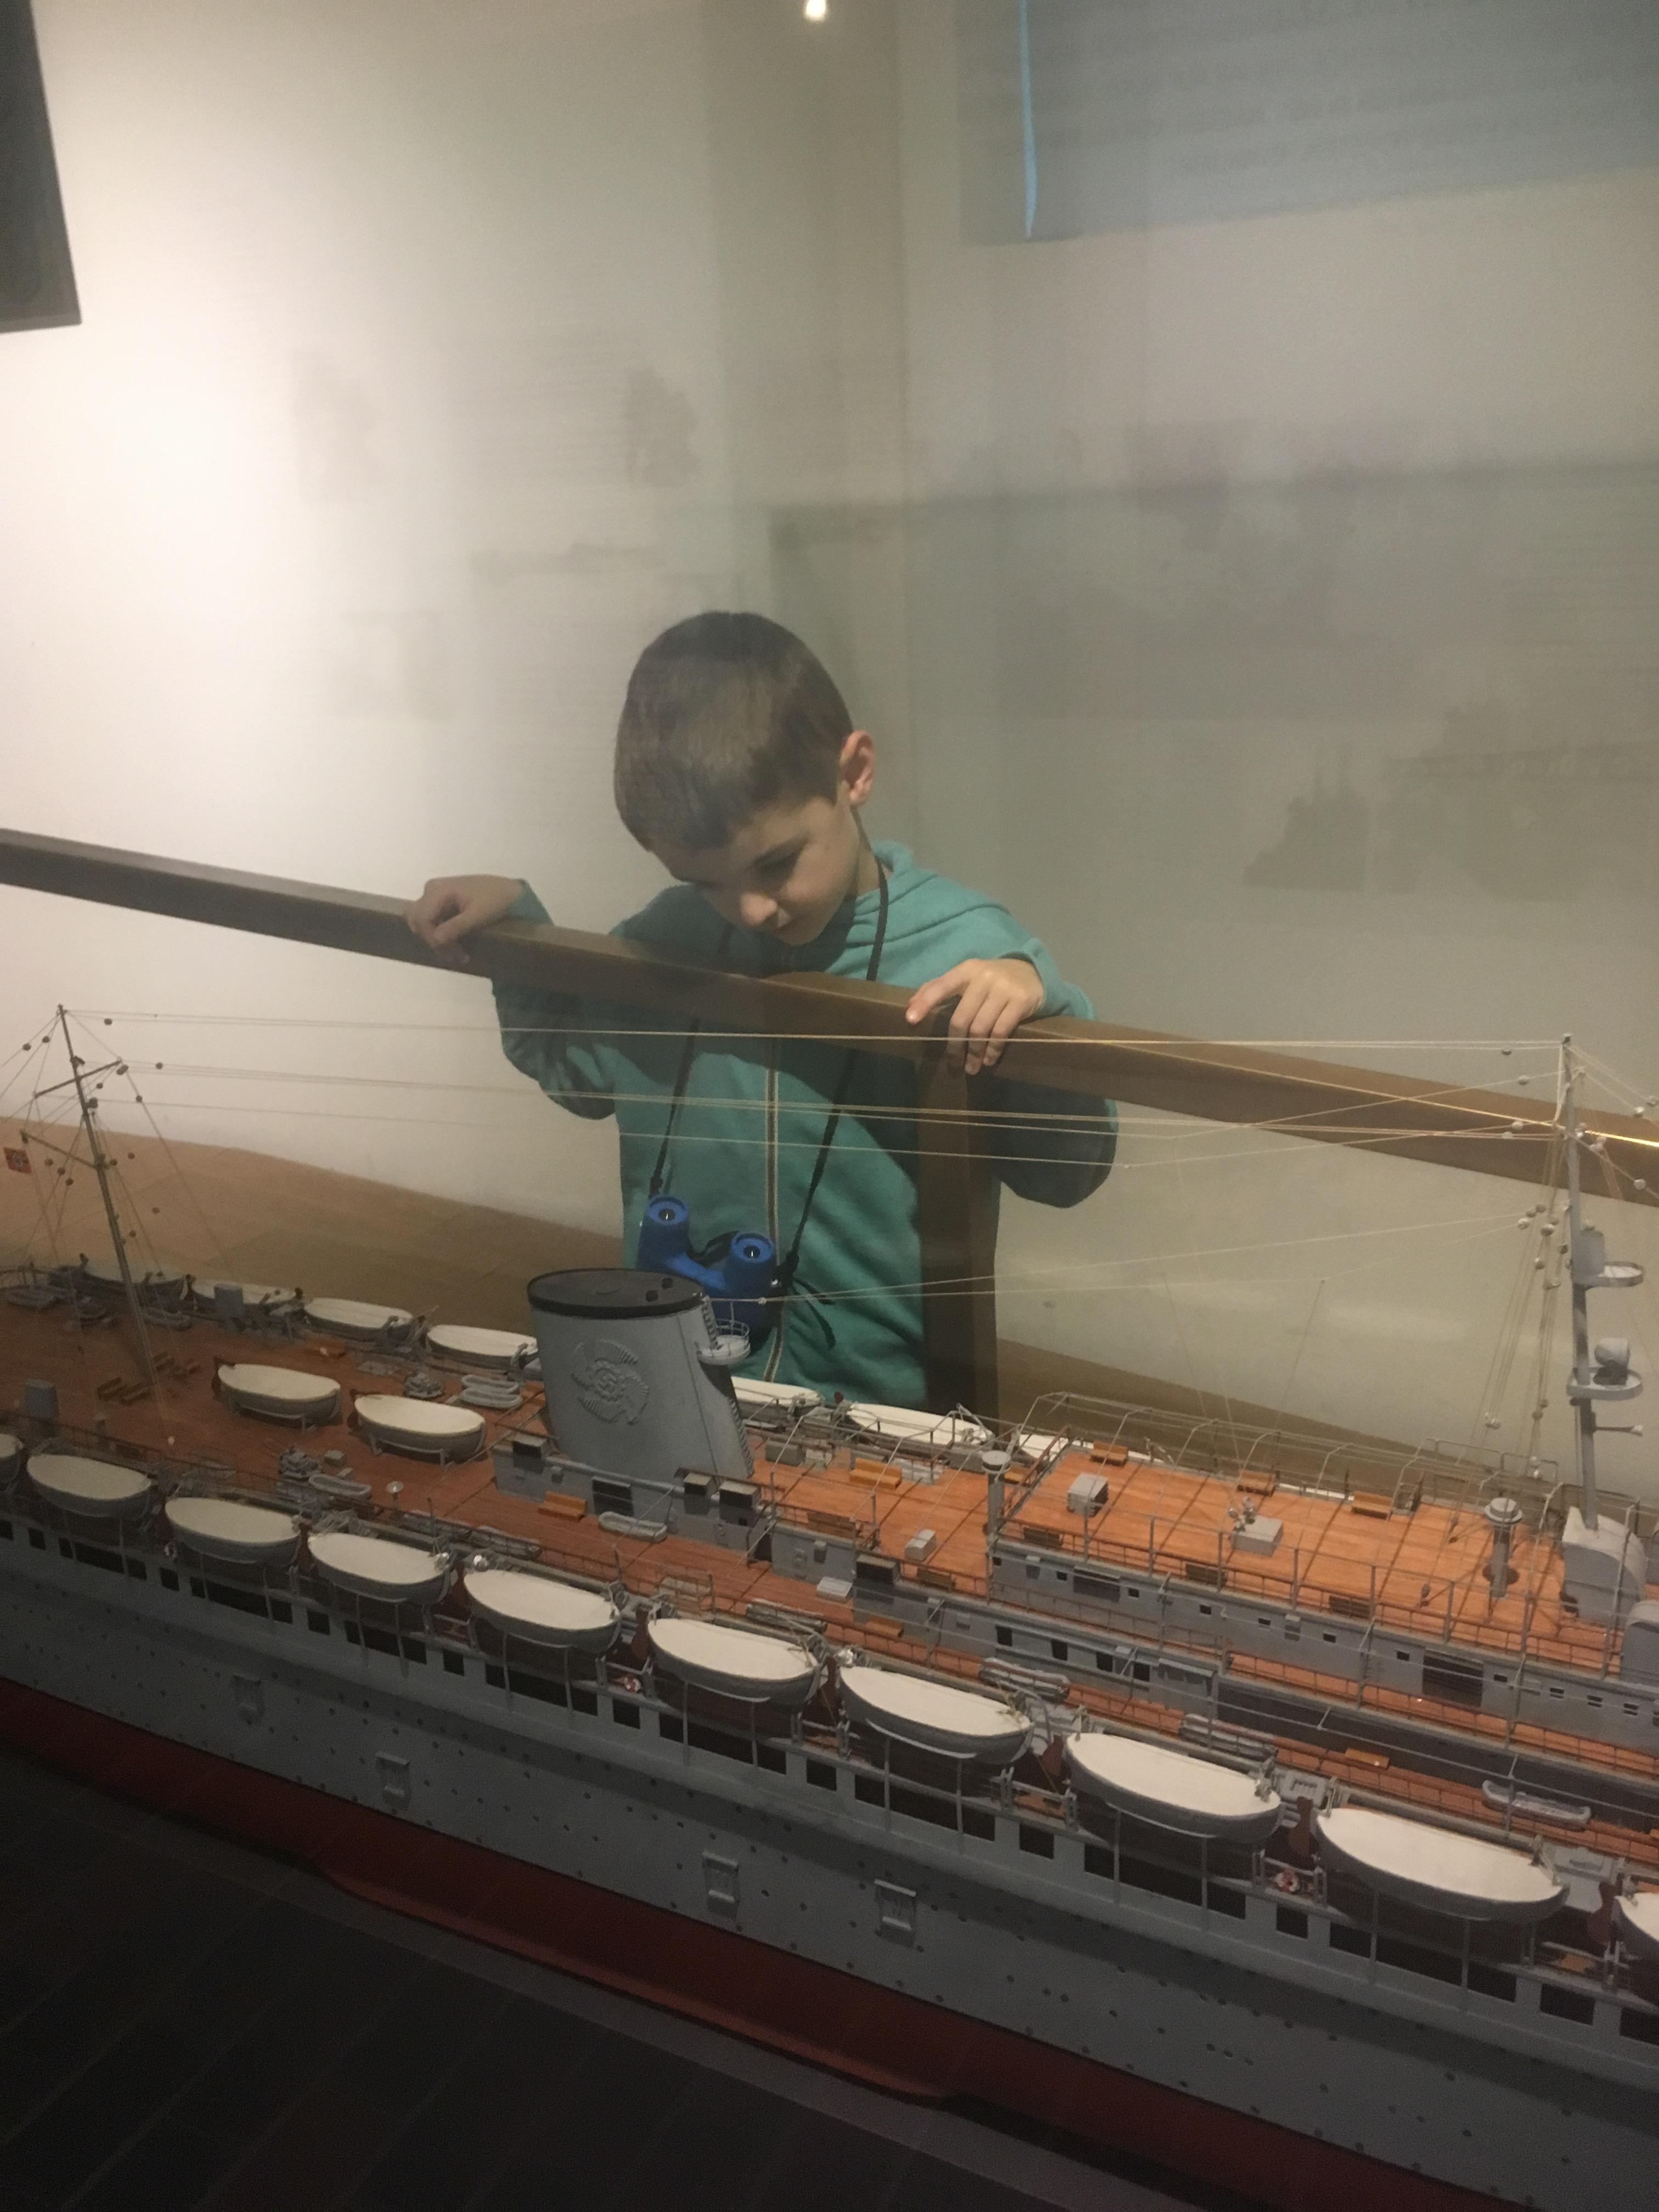 Things Helen Loves, Boy examining model ship.